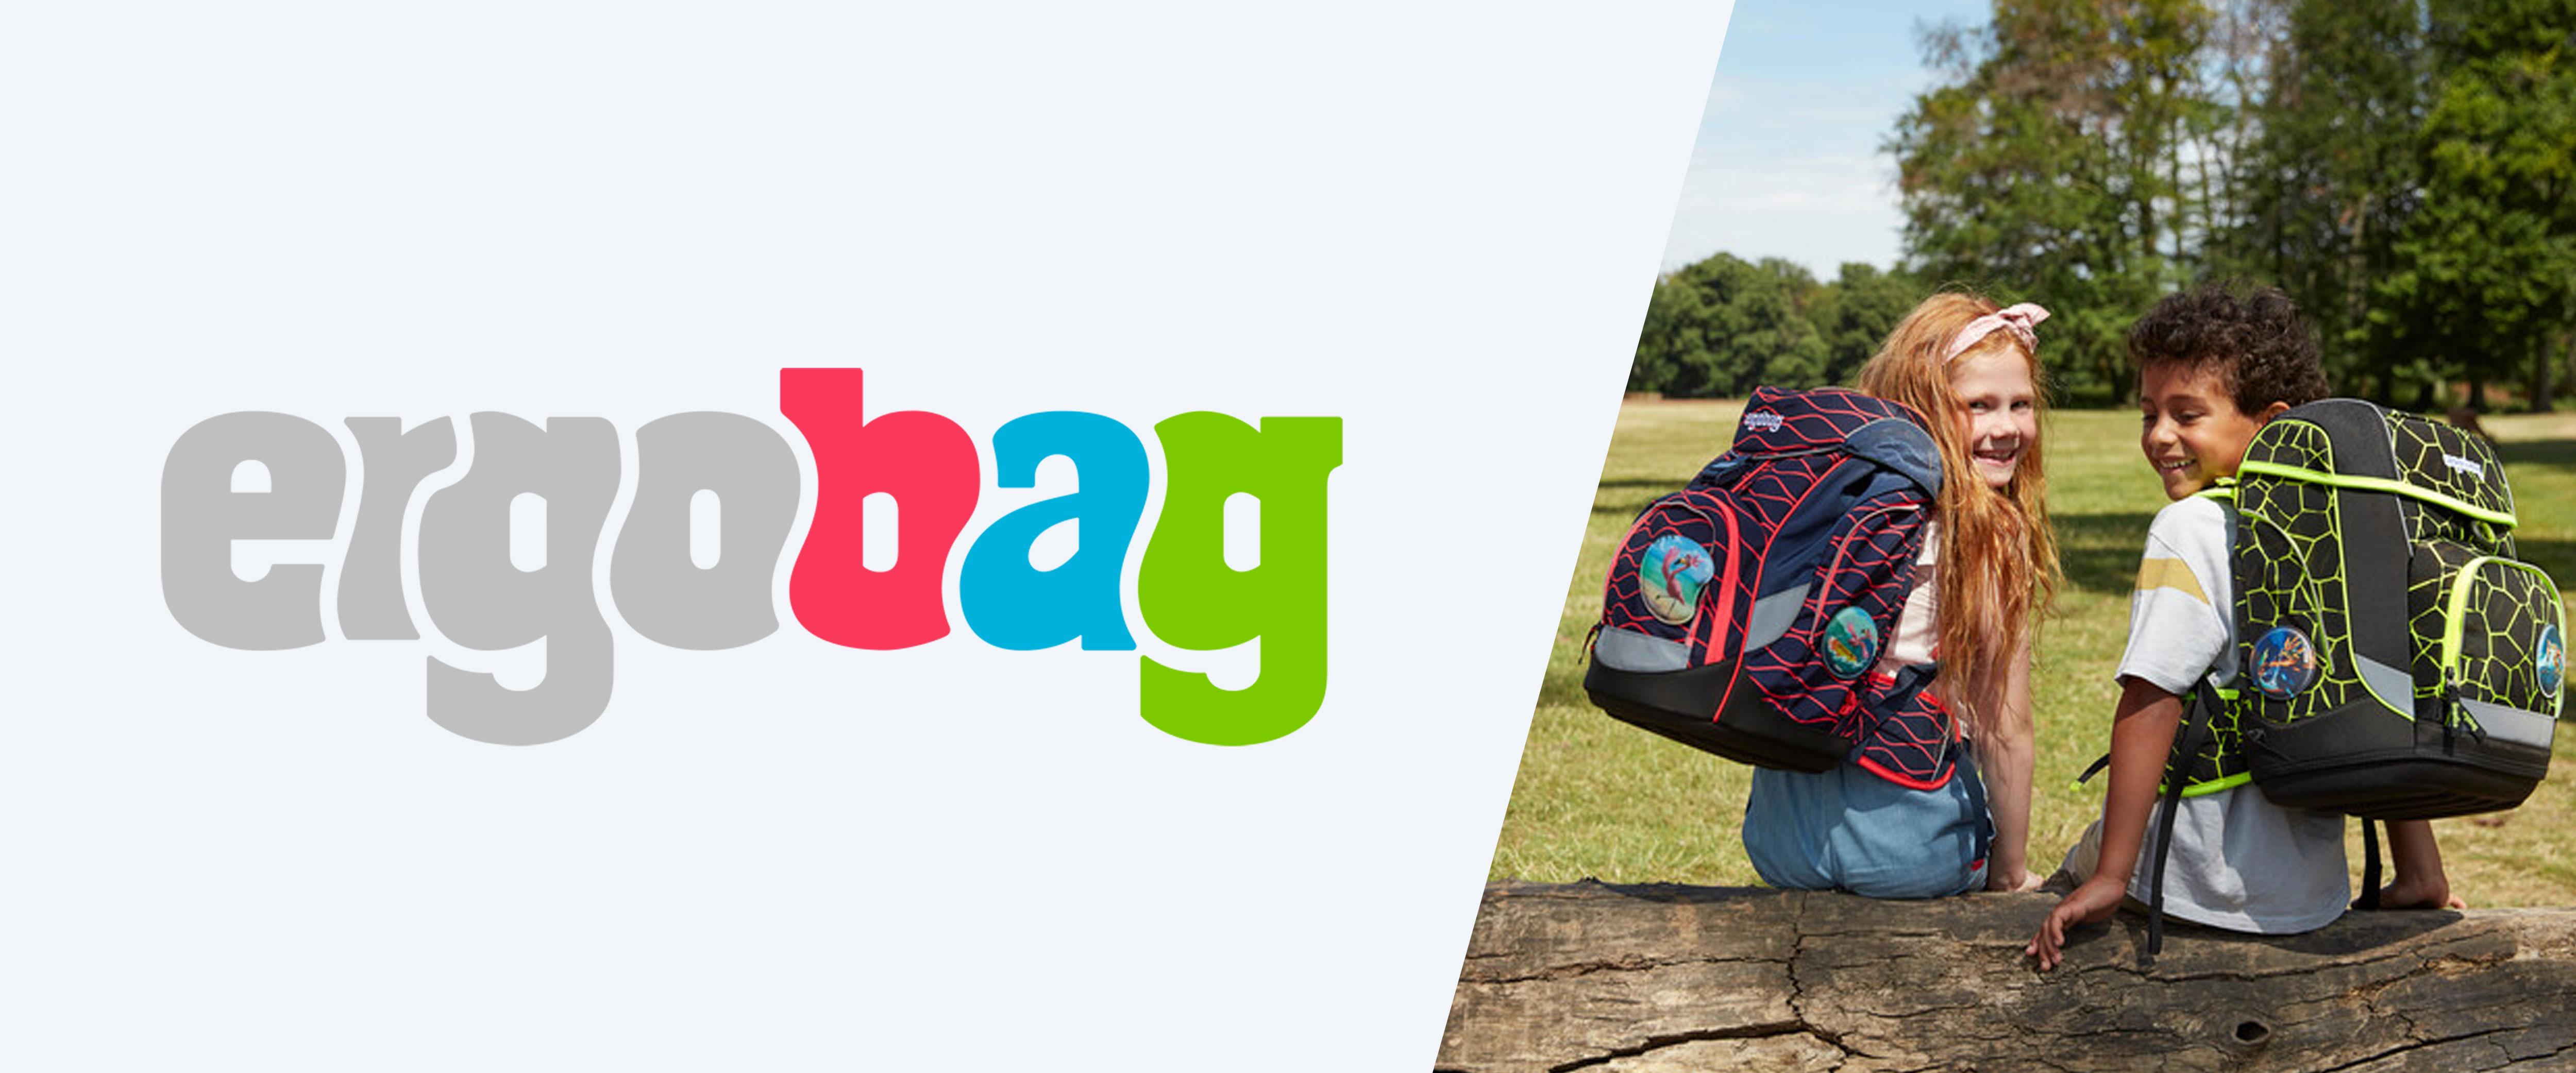 Ergobag Ergonomic School Bags